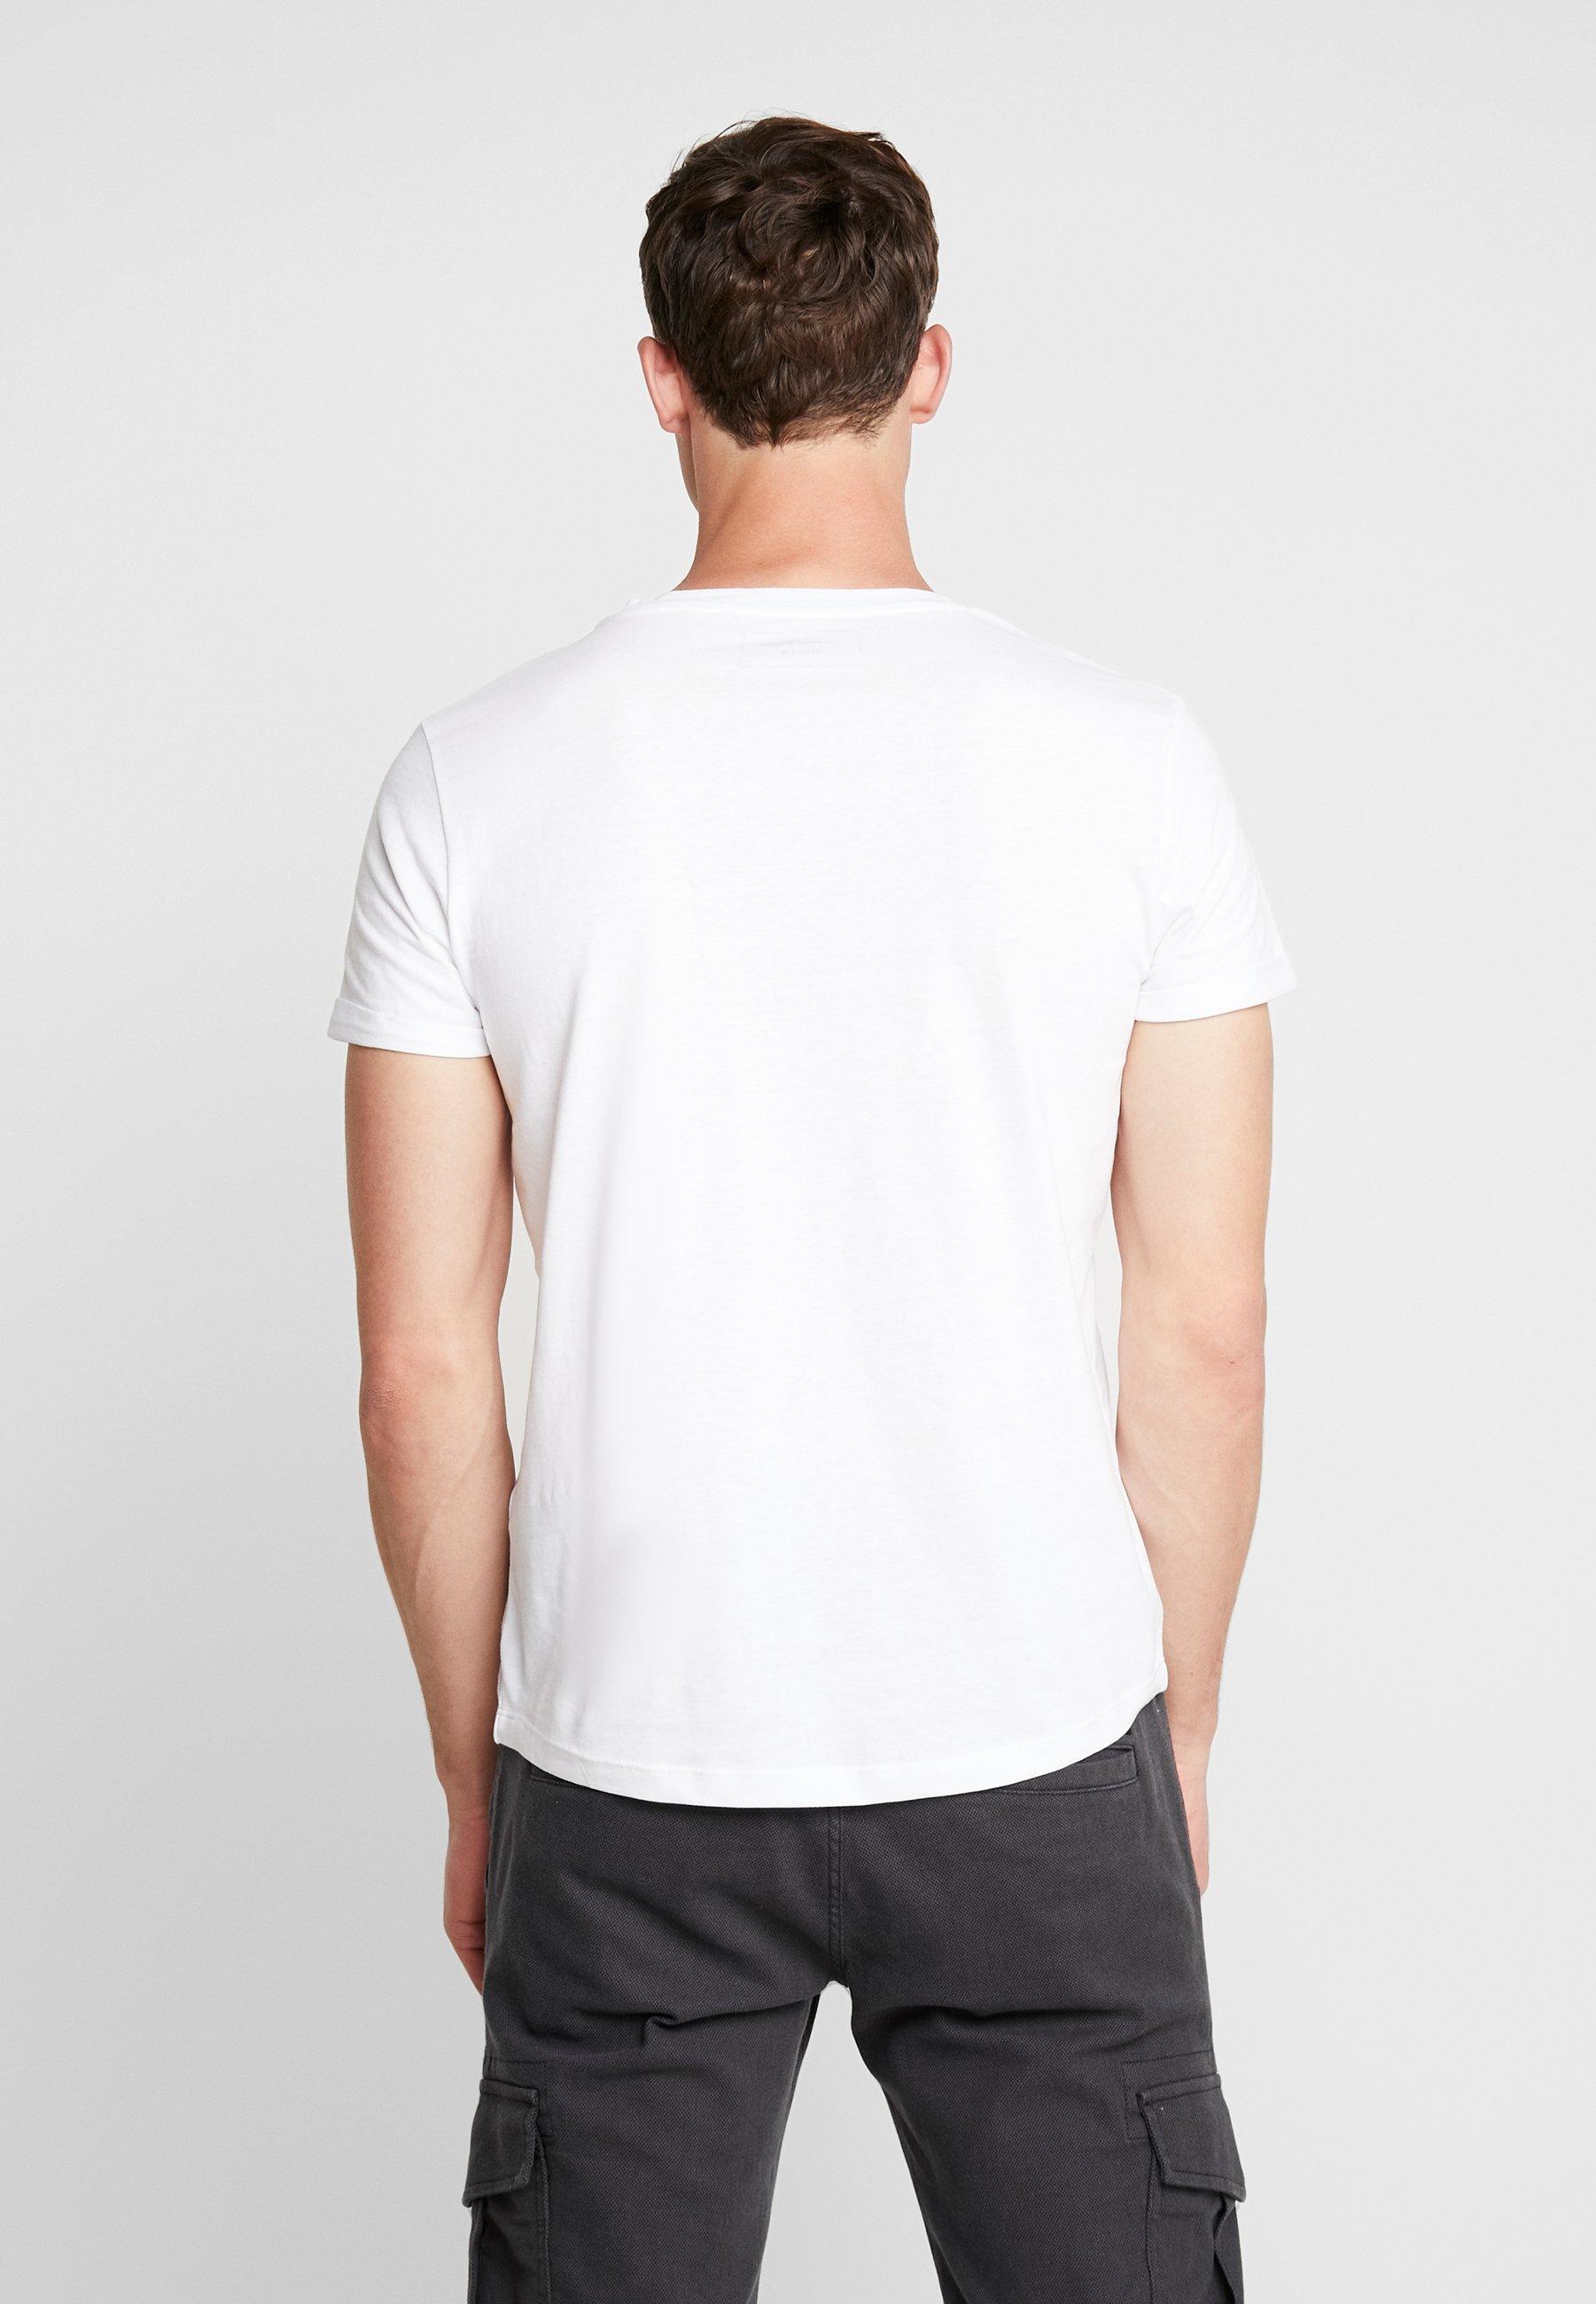 Denim Imprimé Tom White Tailor TurnupT shirt FJTclK1